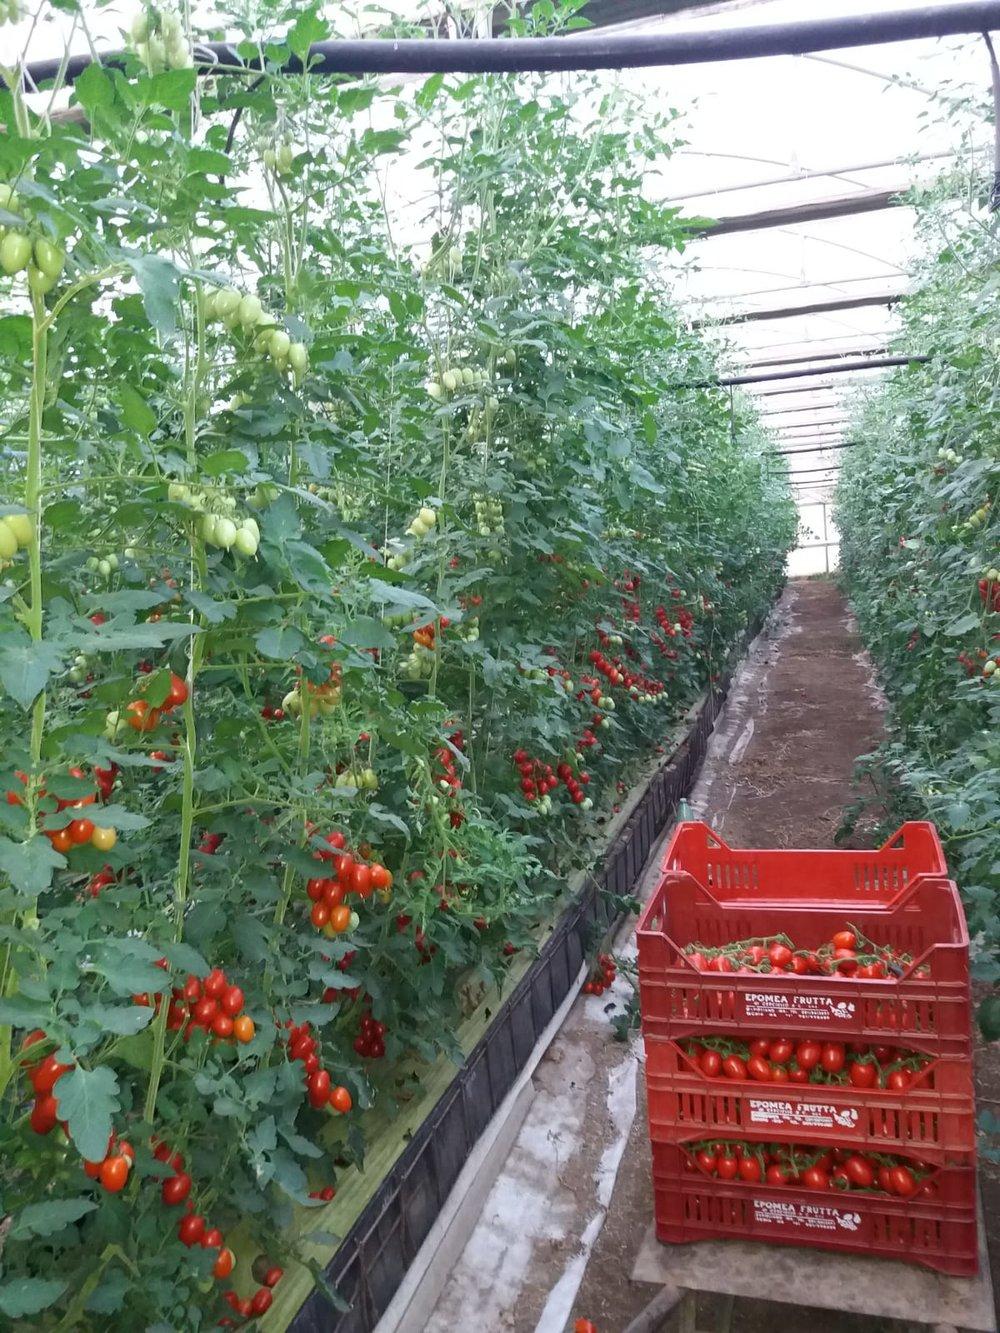 The greenhouse farm where Bakary David picks vegetables. Near Naples, Italy; August, 2018. © Pamela Kerpius